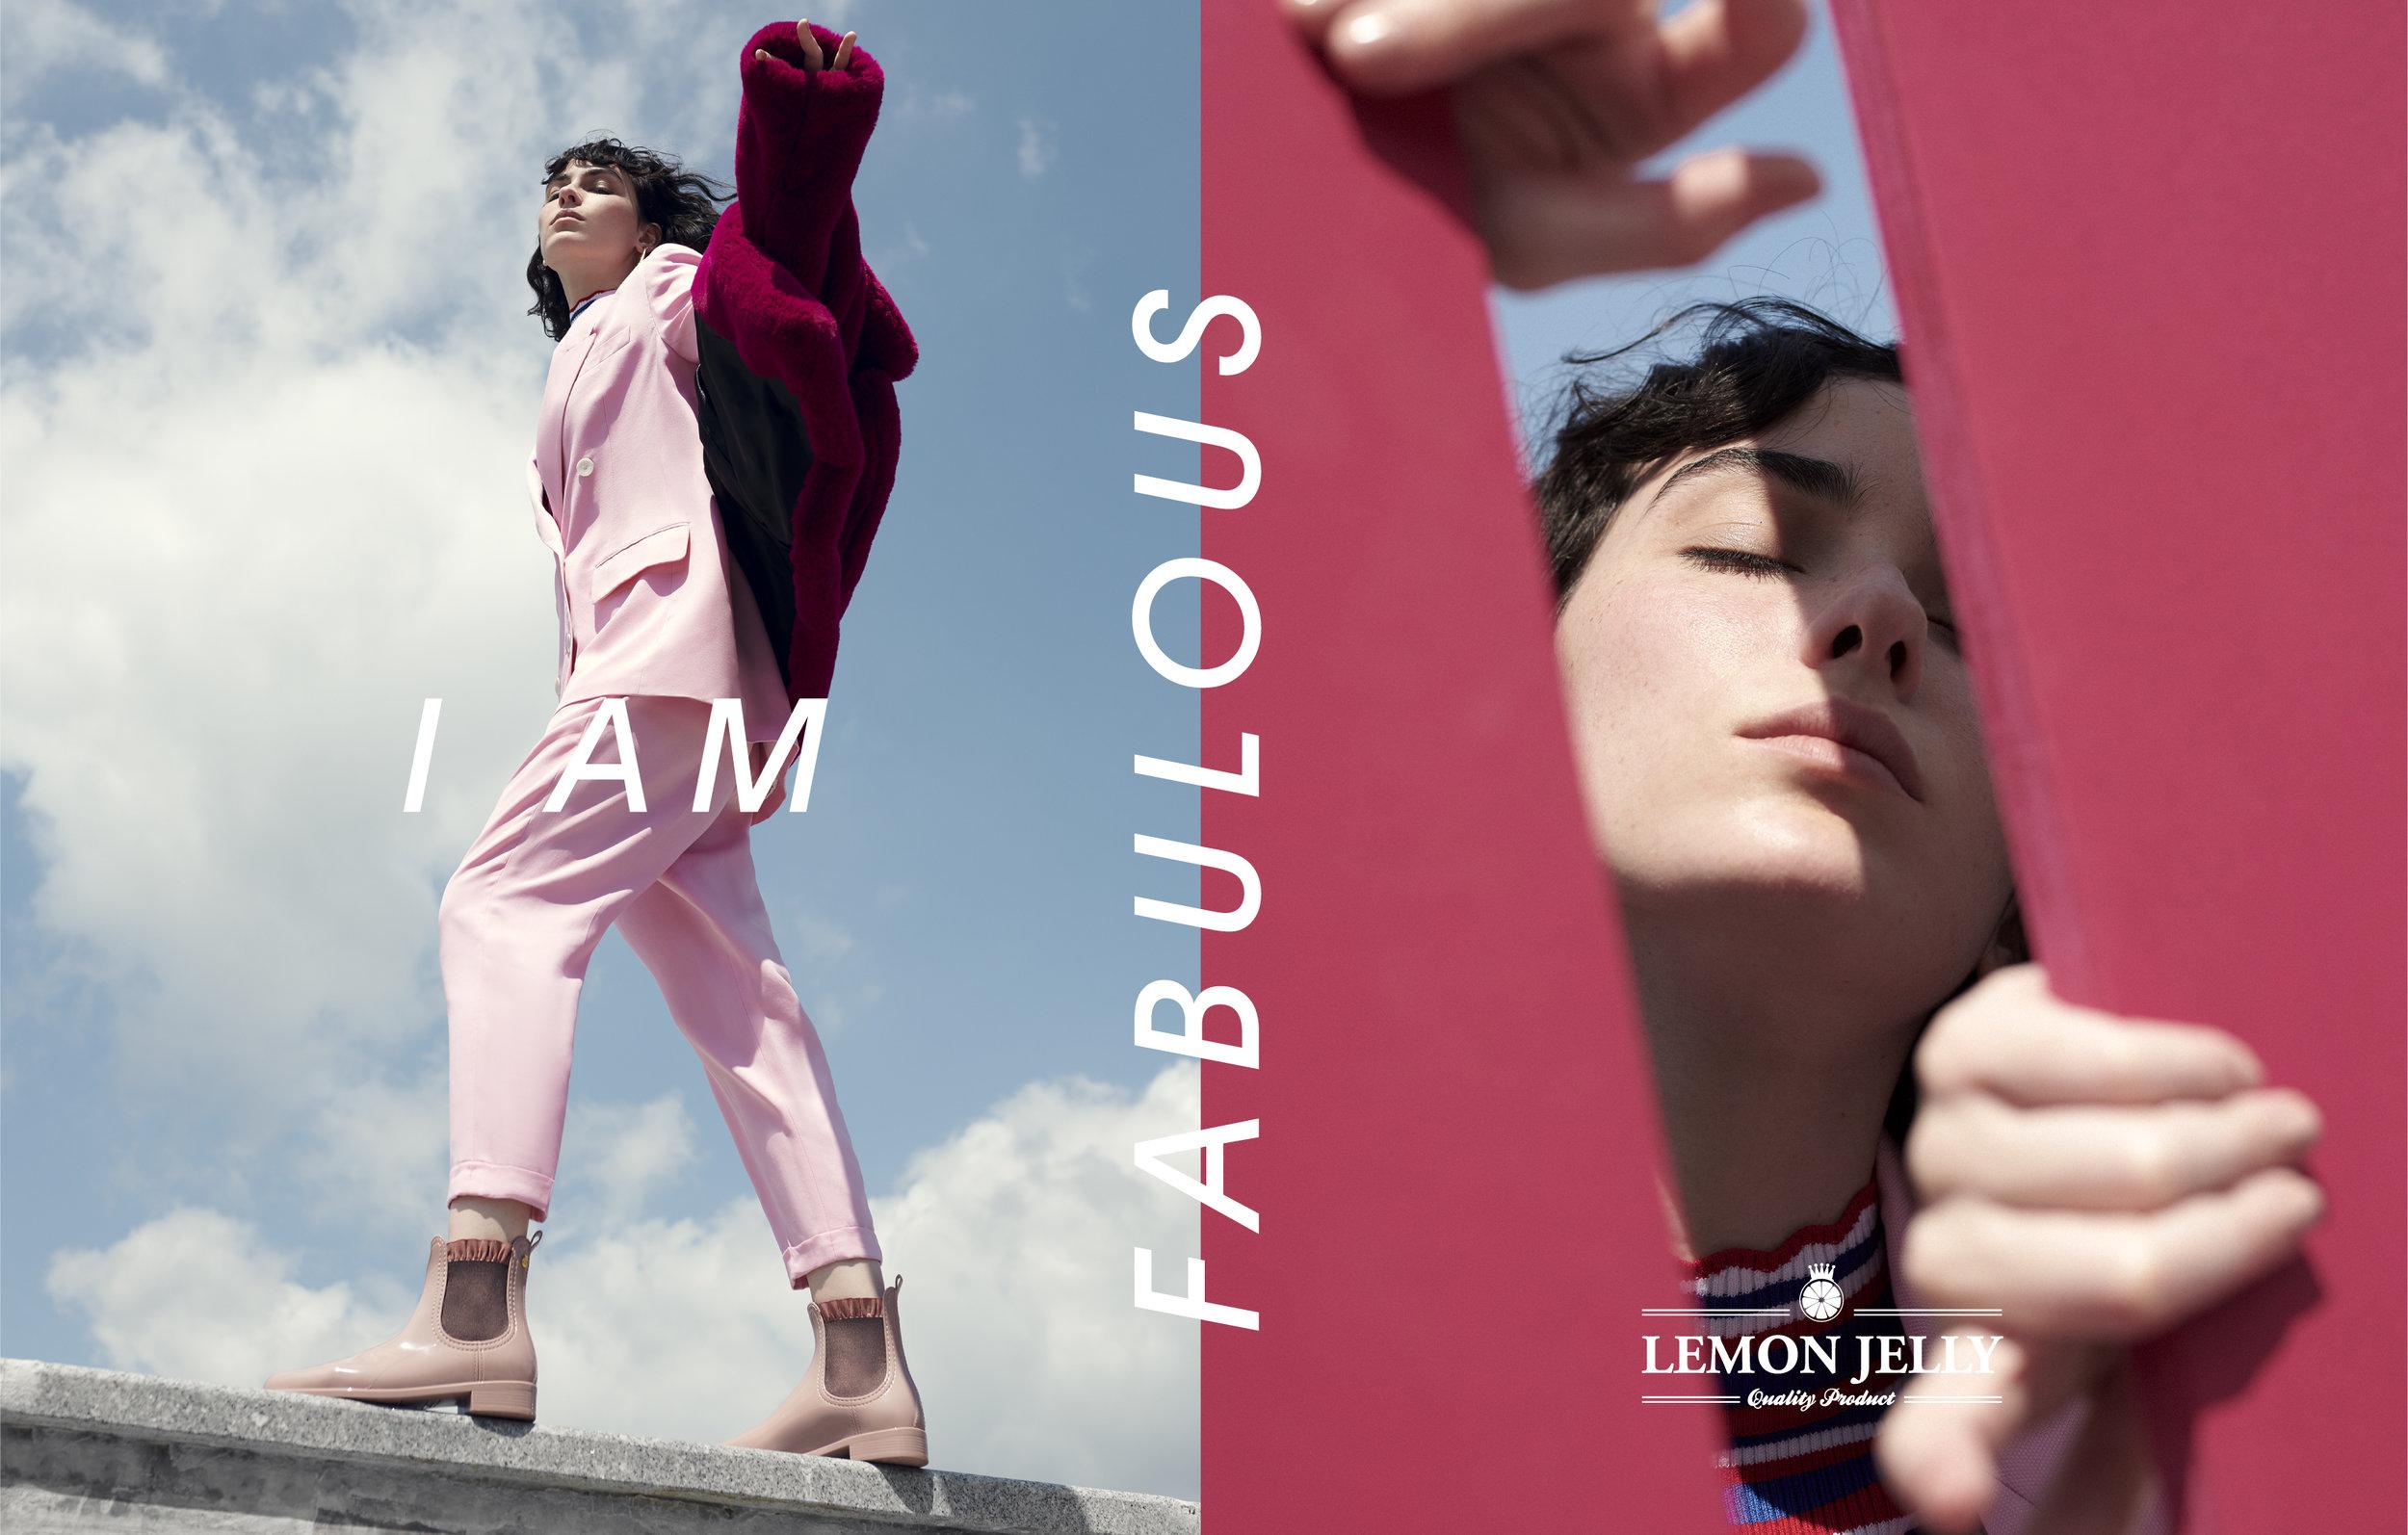 Lemon Jelly, Frederico Martins, Lalaland Studios